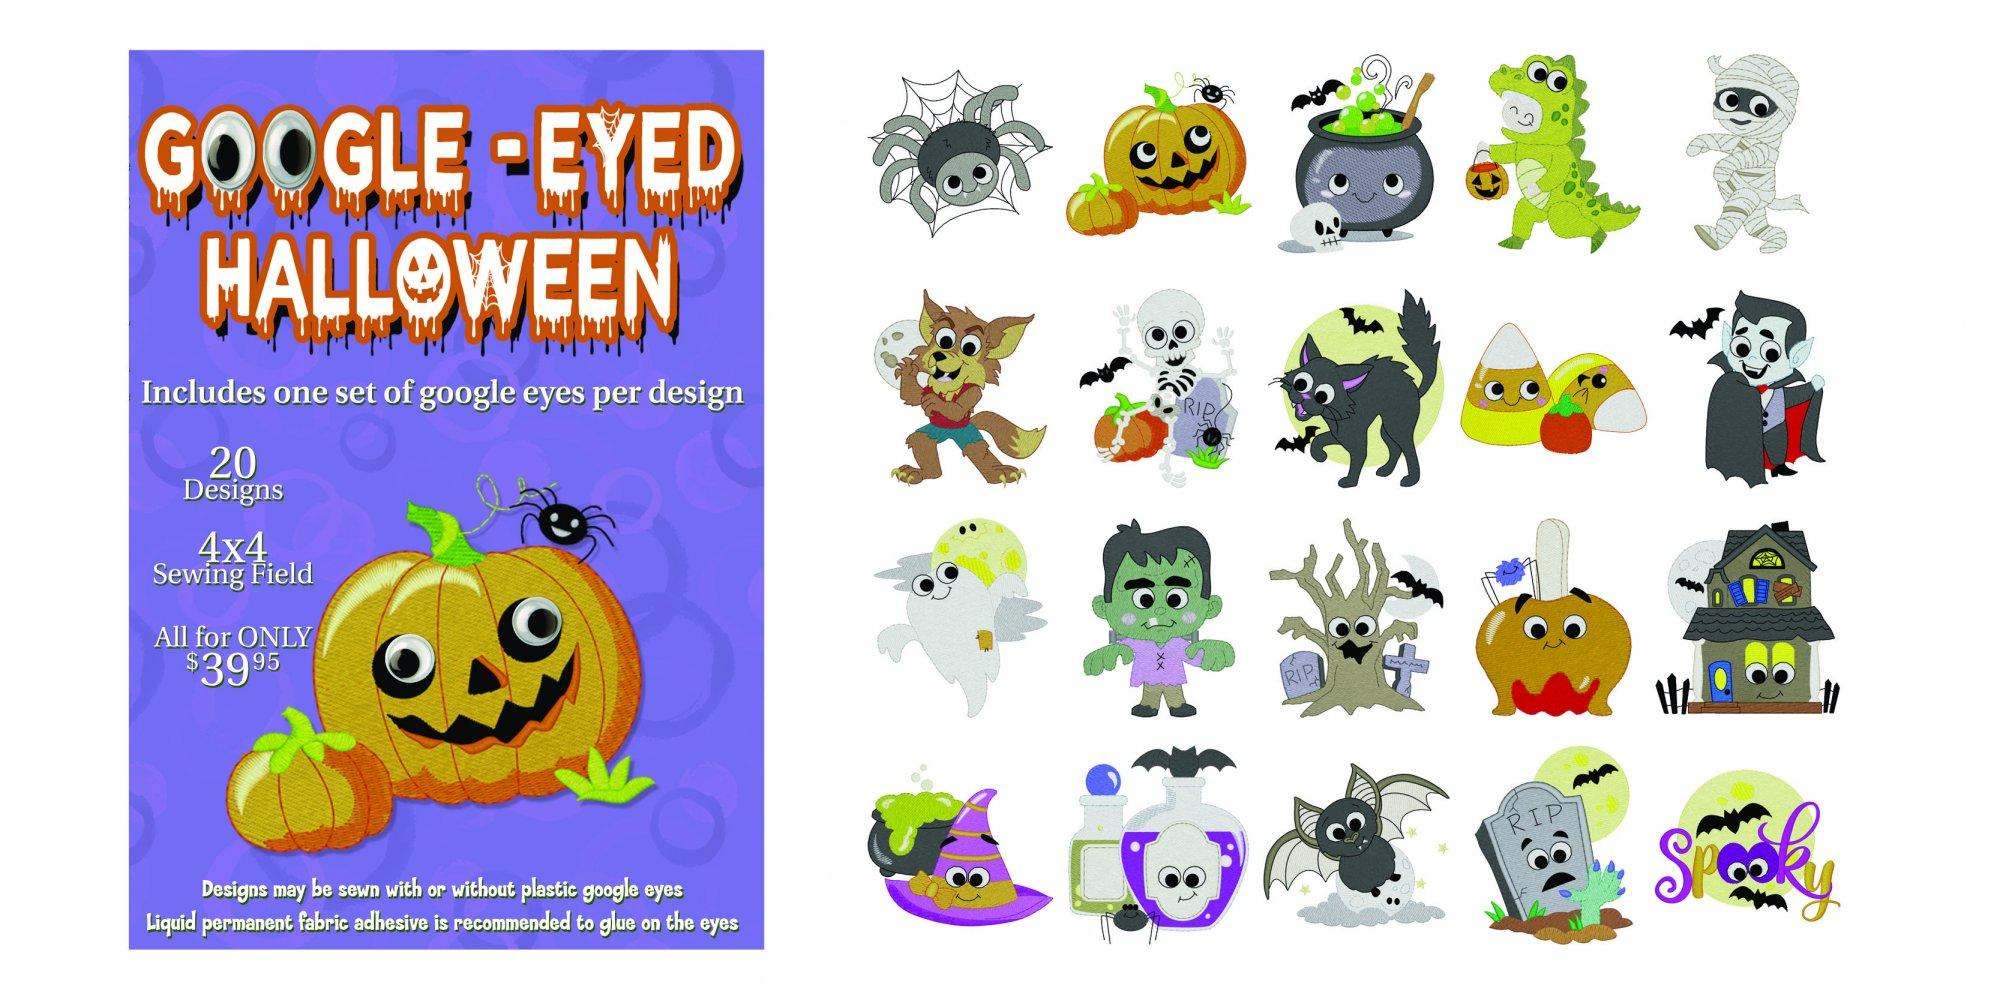 970789 Google-eyed Halloween (4x4)